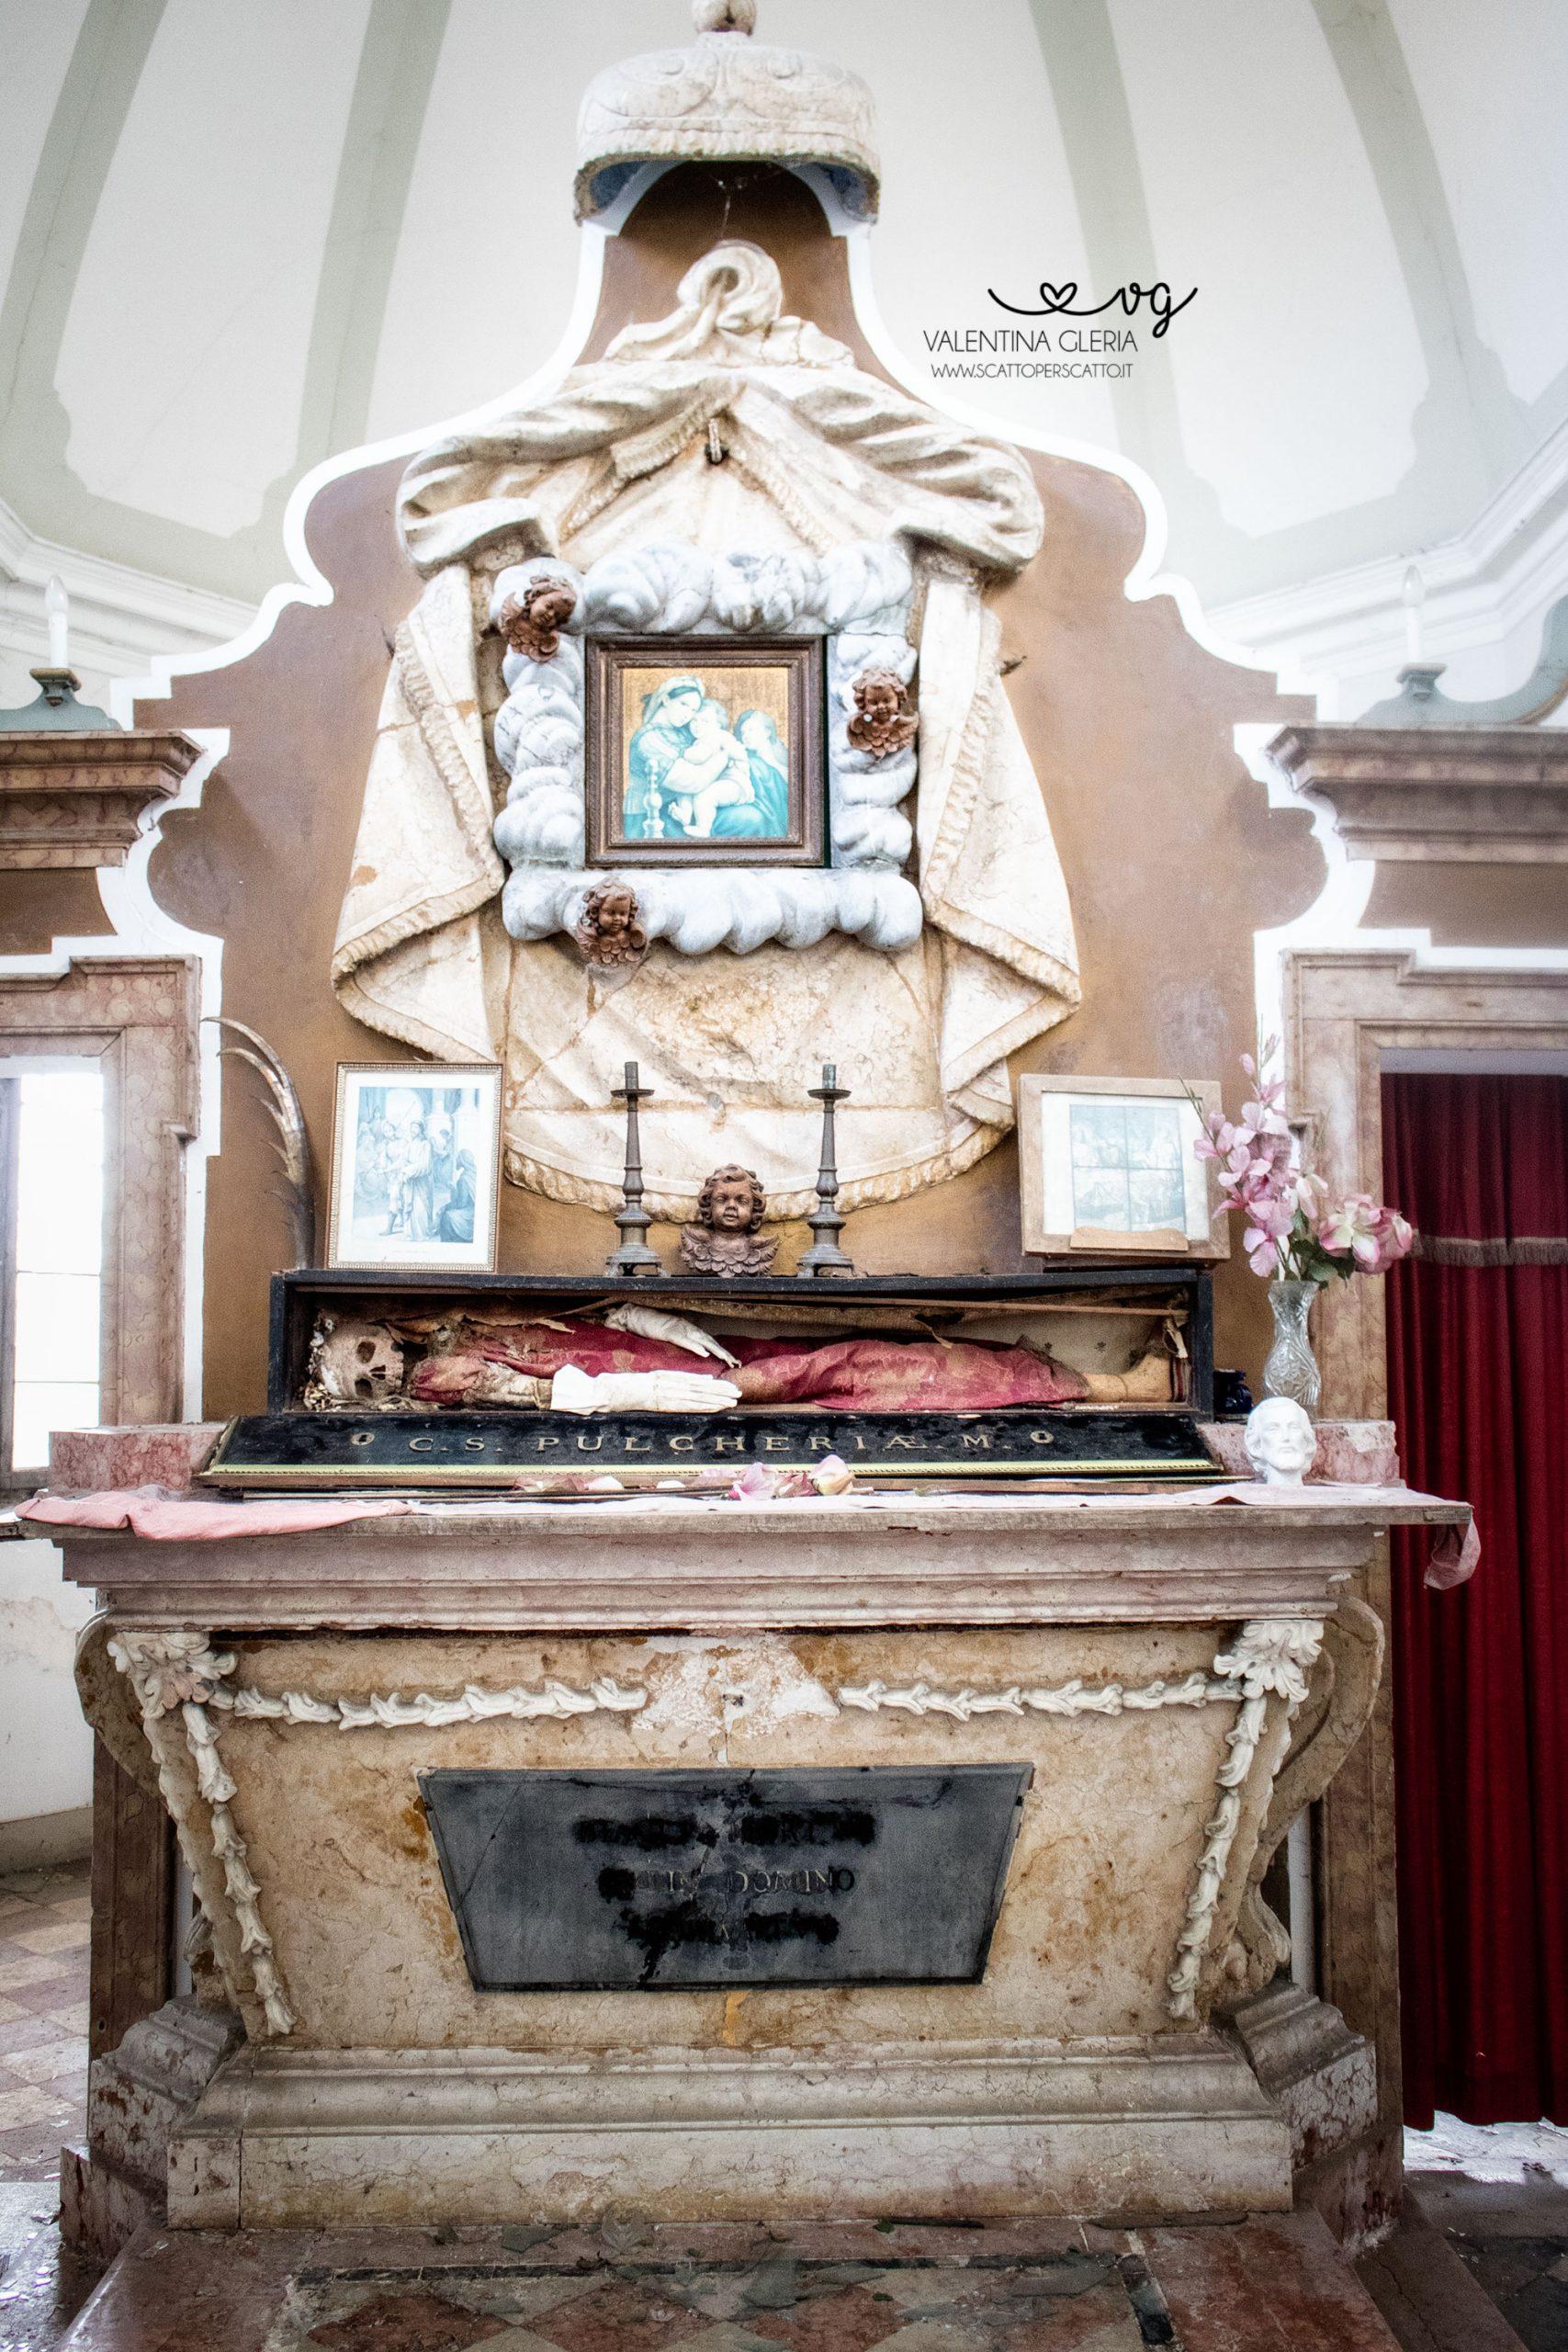 Le reliquie di Santa Pulcheria